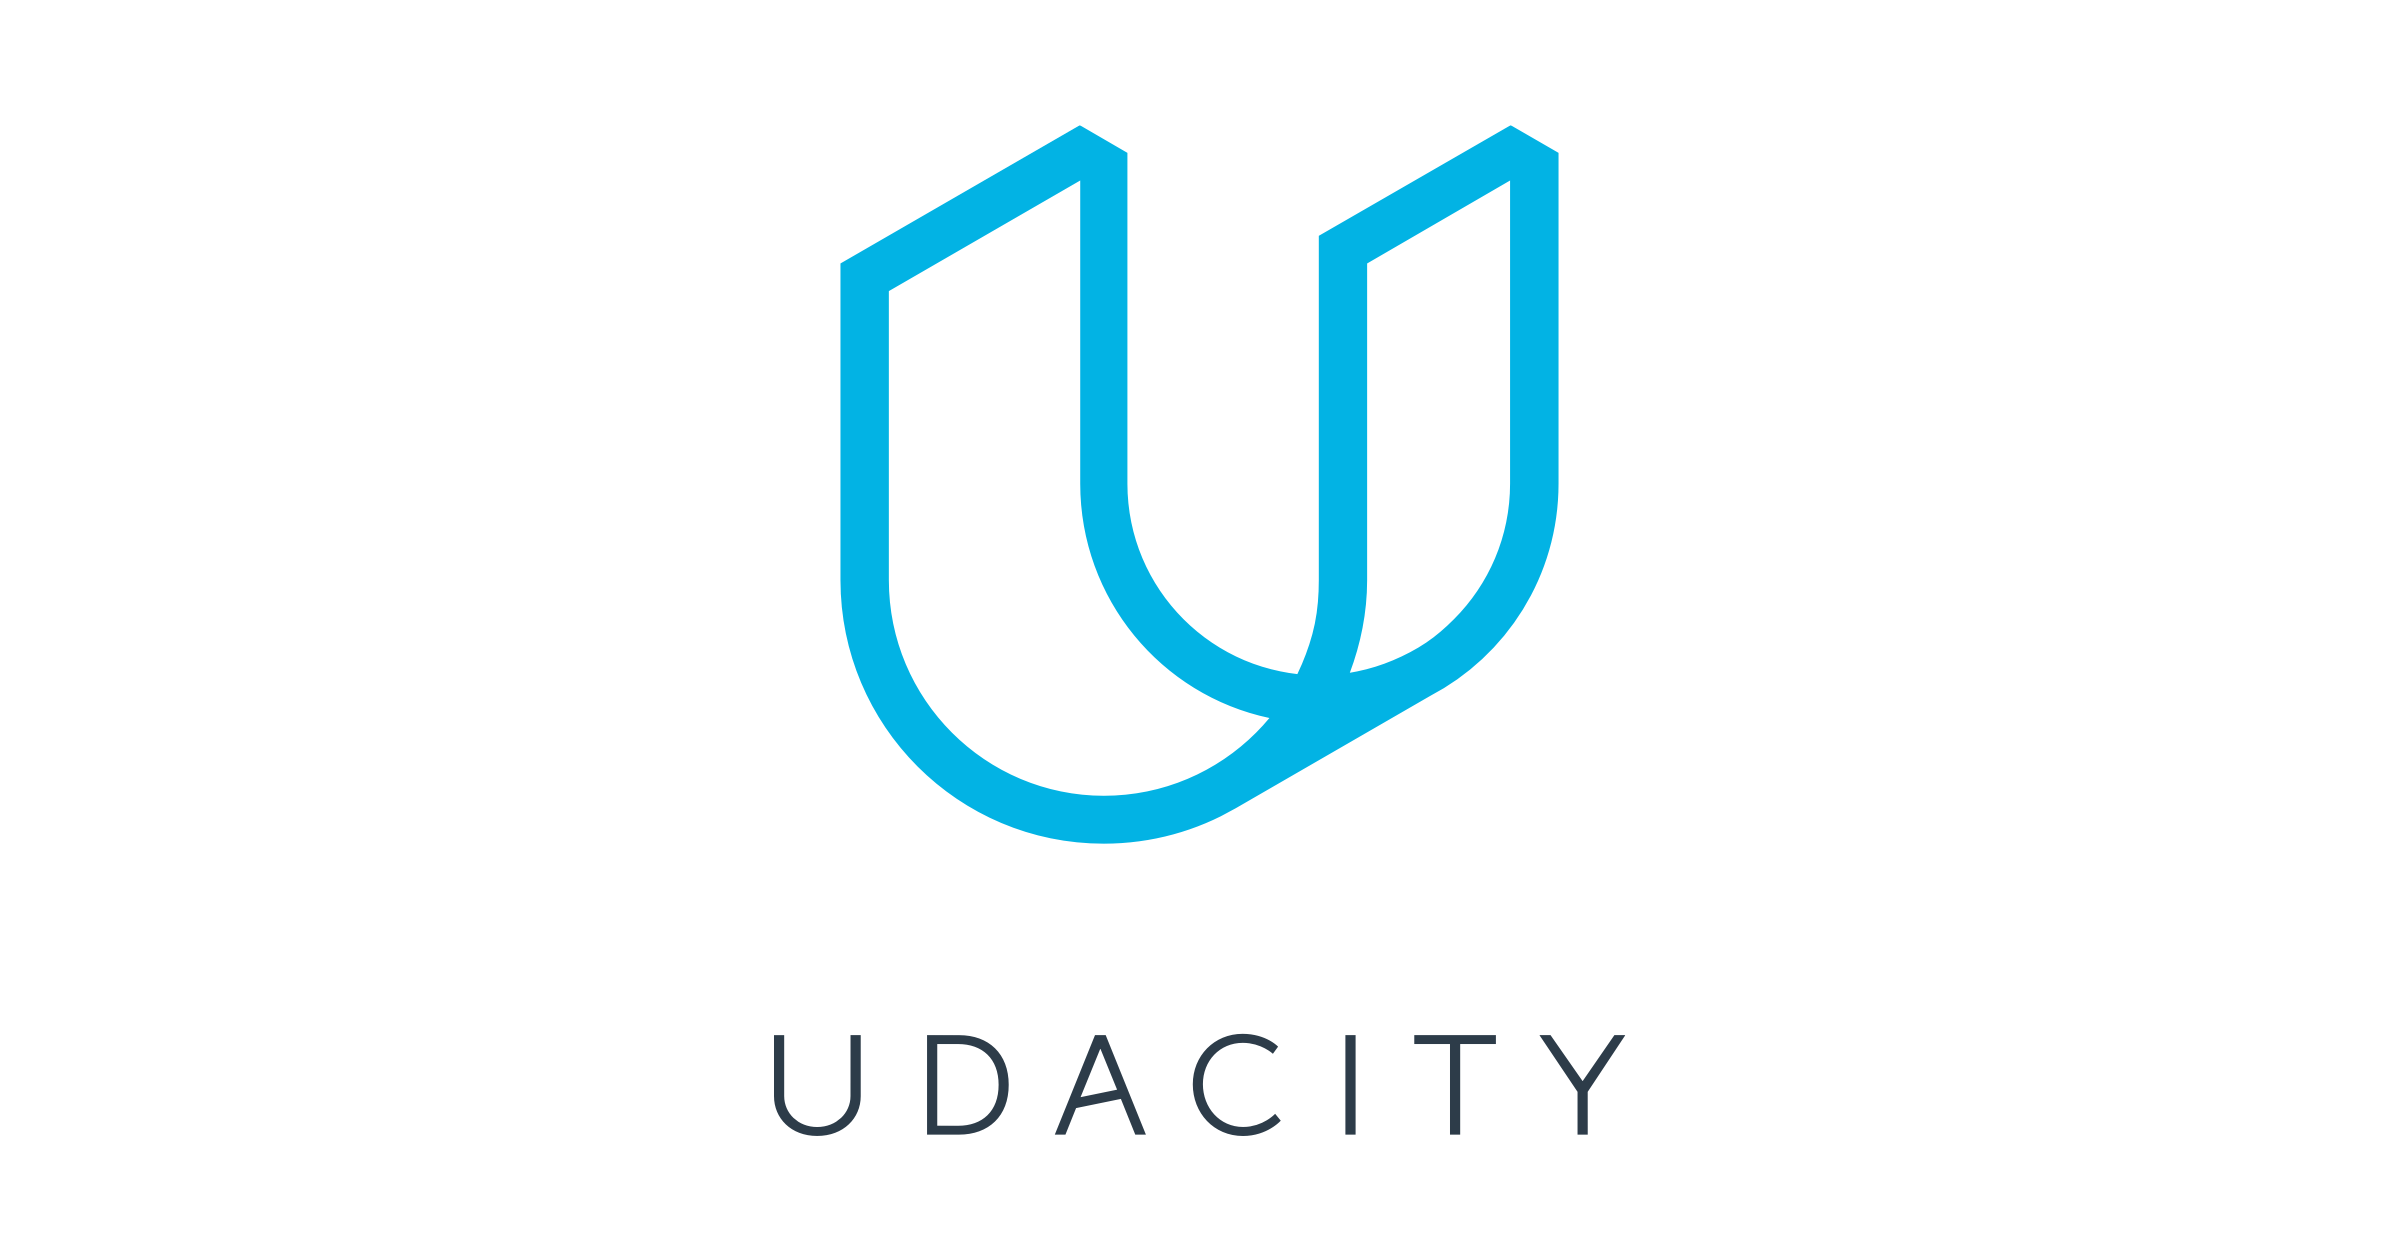 udacity Next Coders